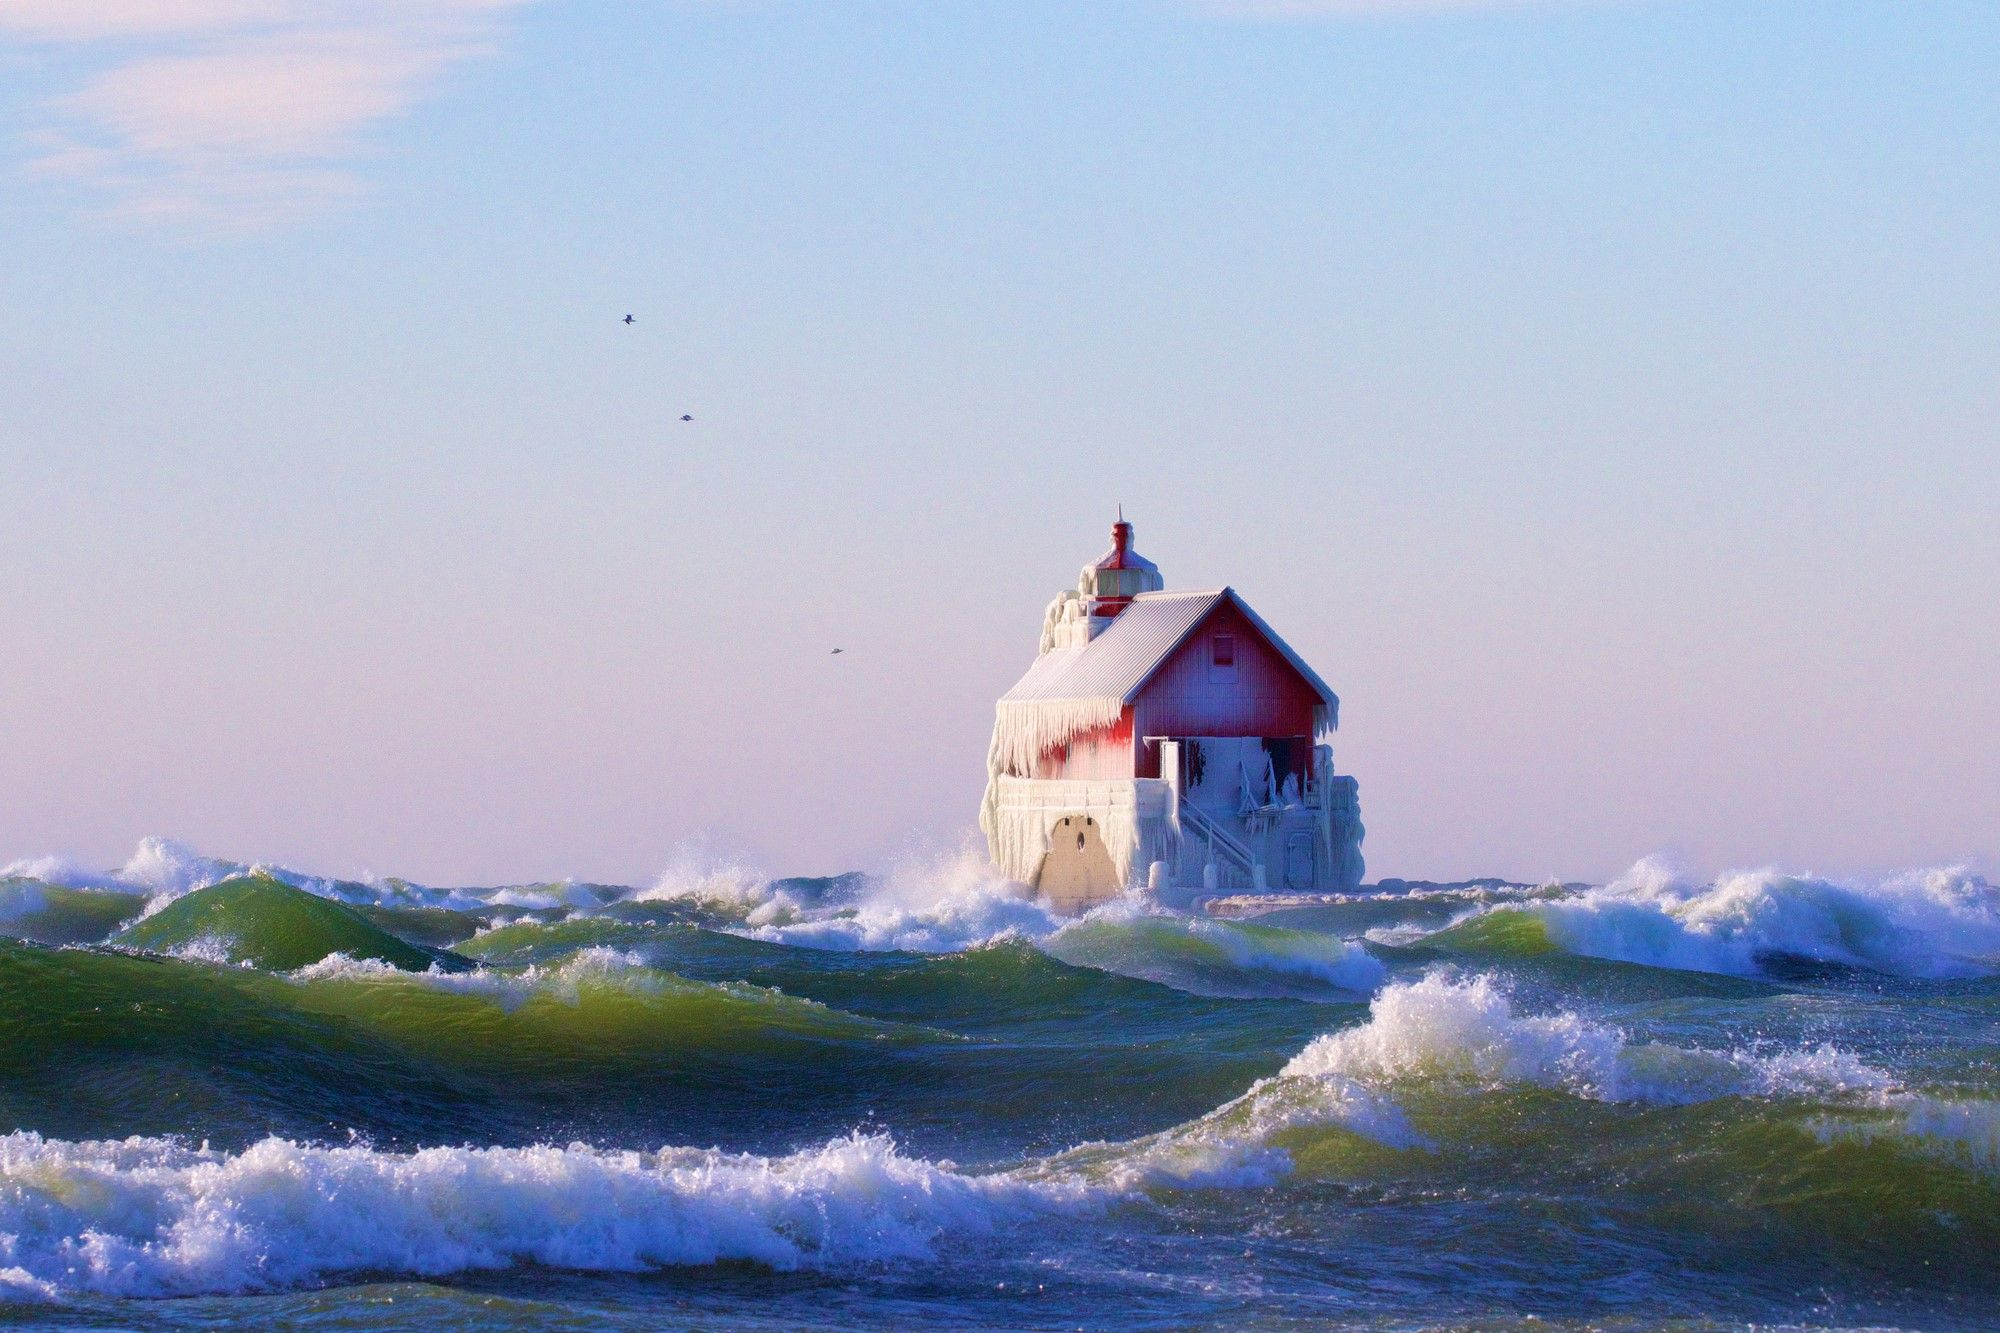 Freezing Temperature Turns Lighthouse Into Enchanting